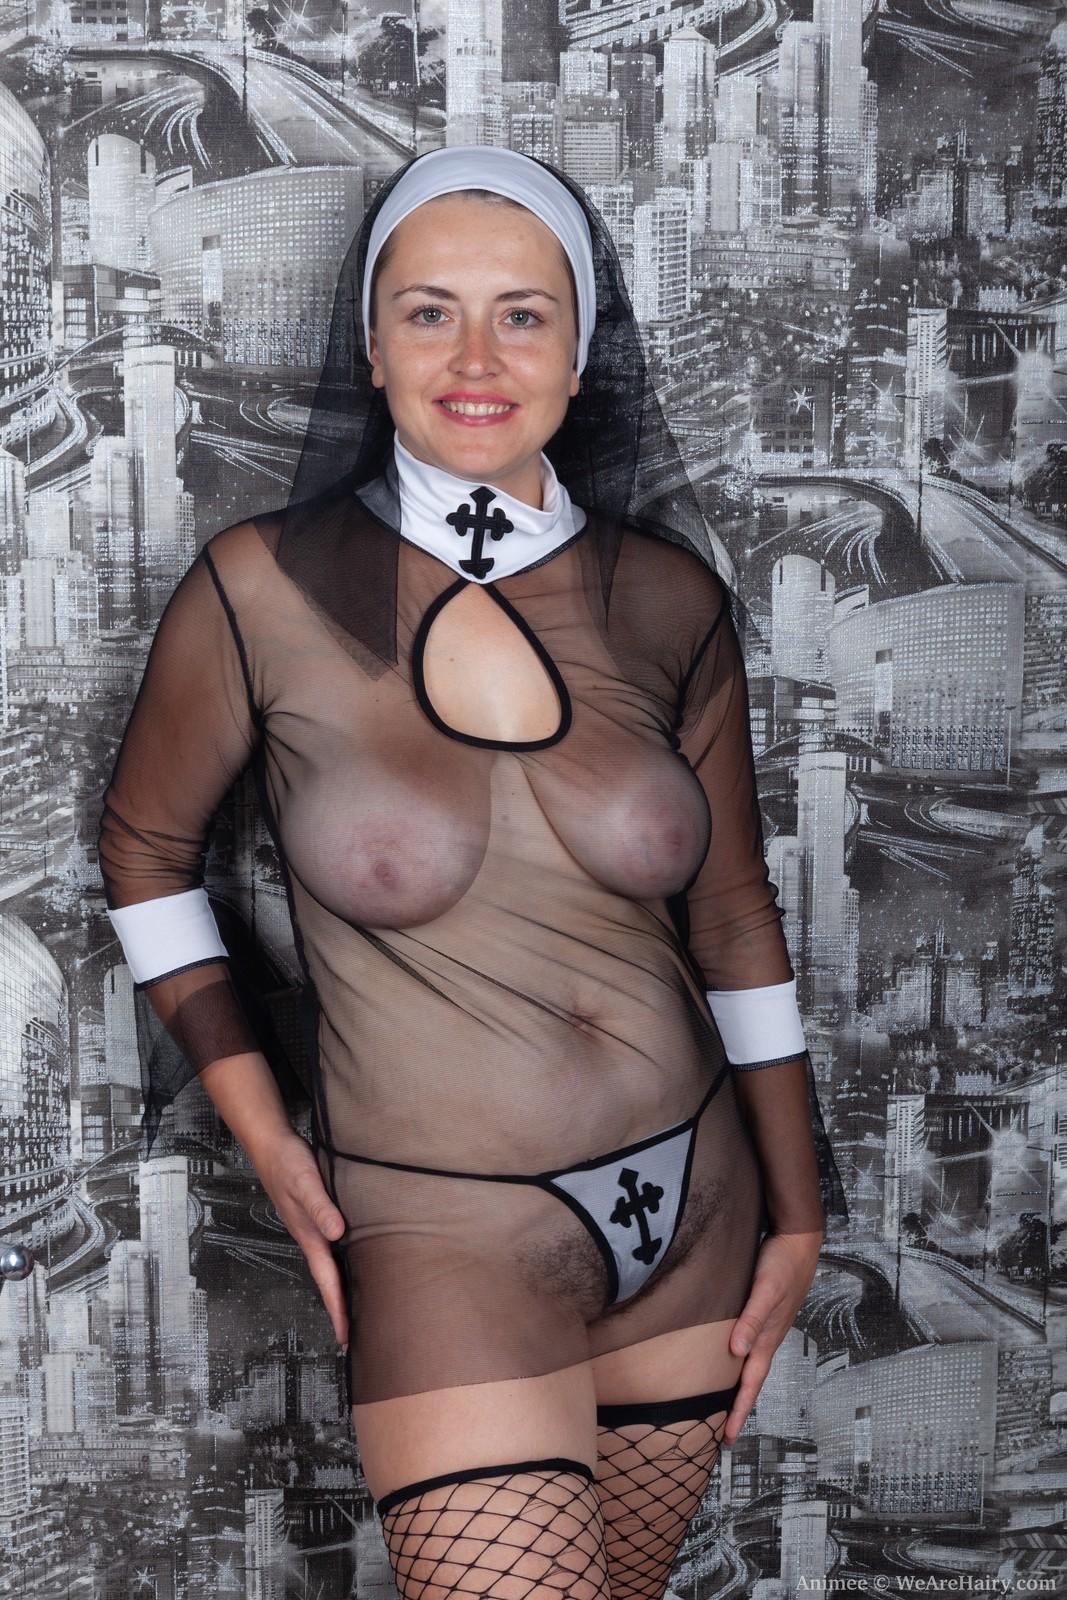 Animee dresses as a nun and then masturbates